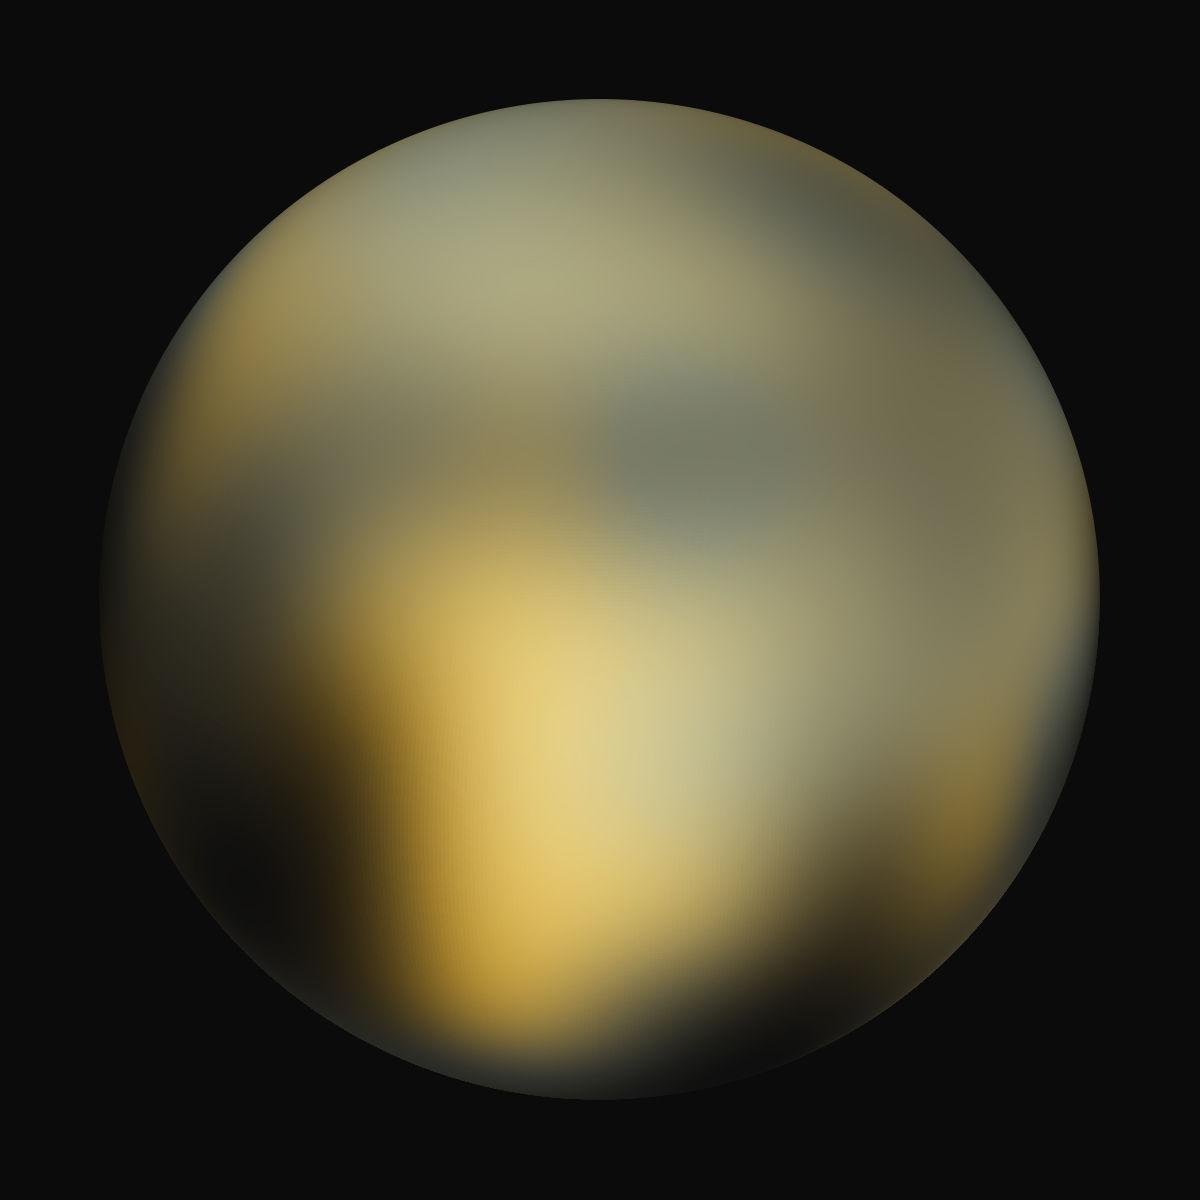 Pluto Hubble Telescope